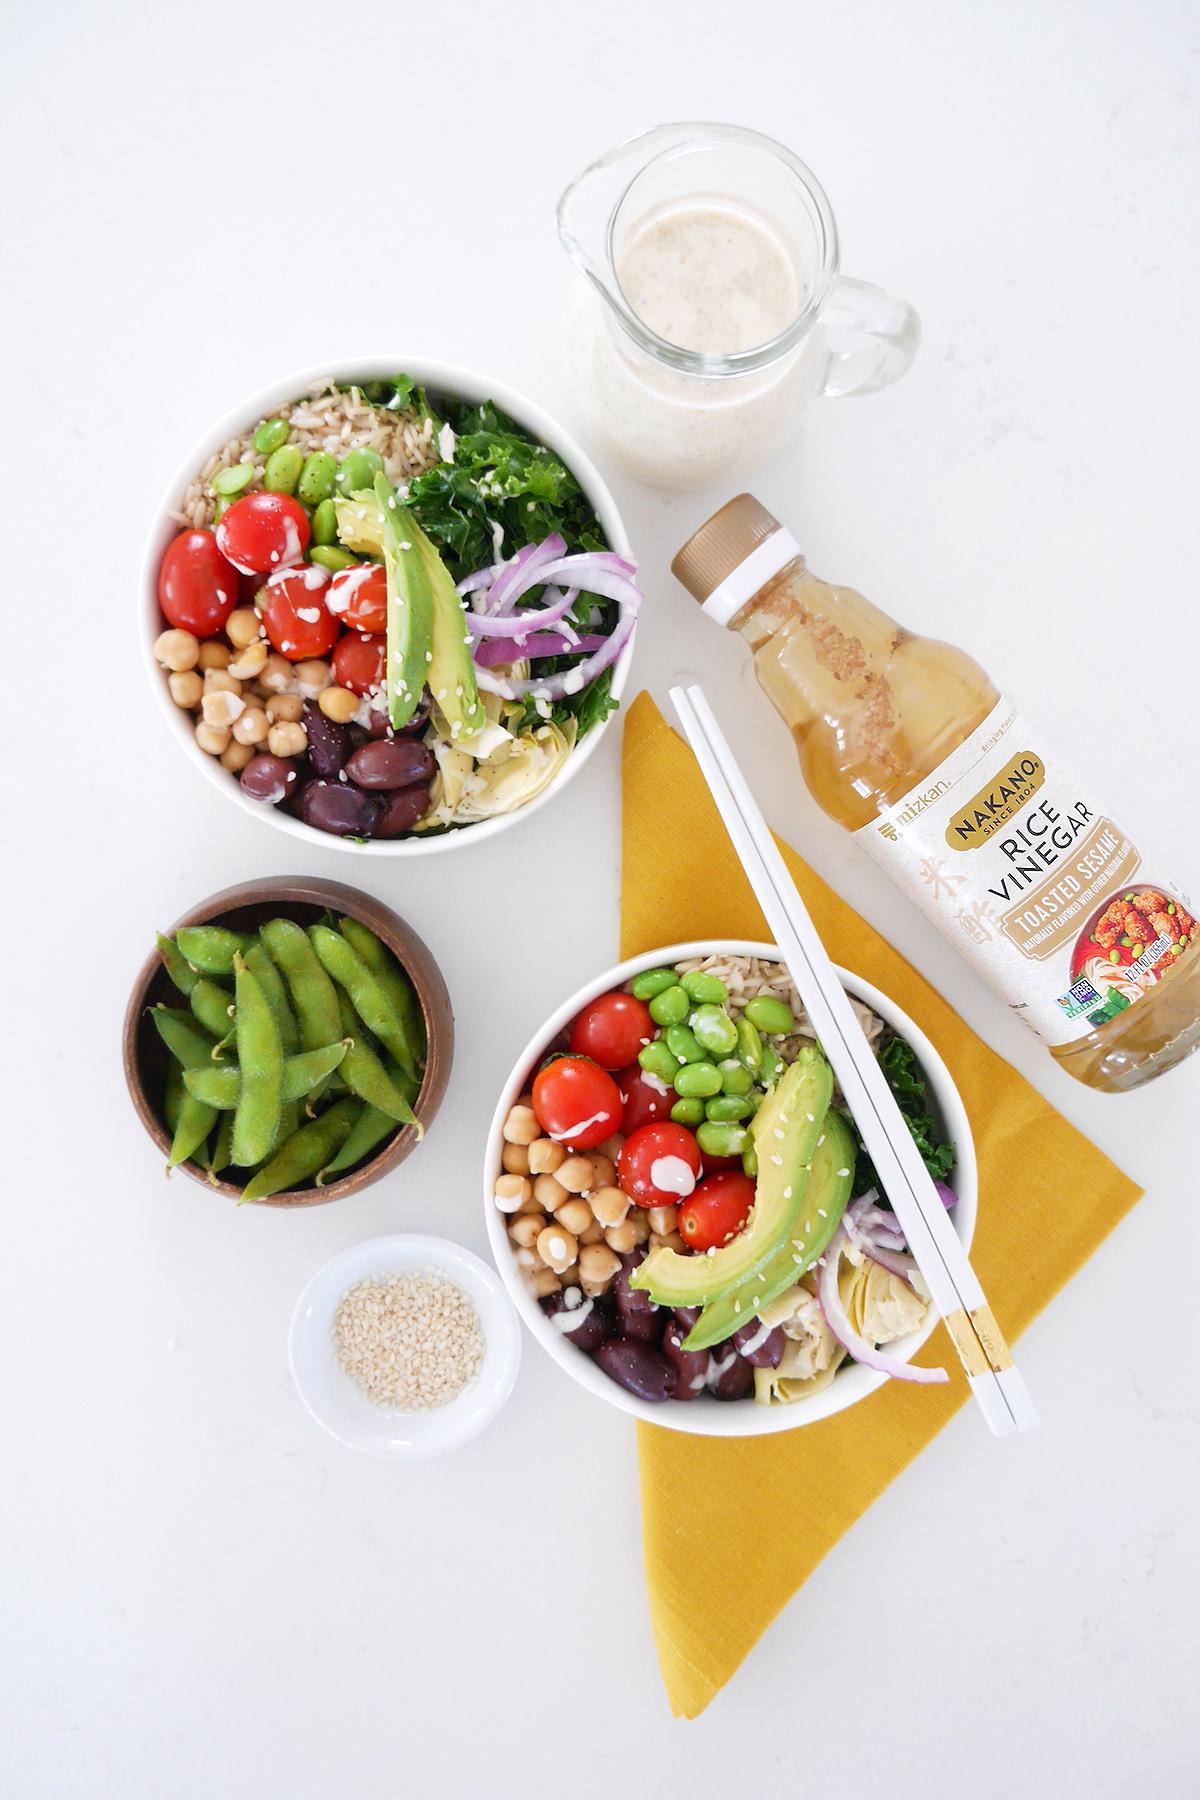 NAKANO Toasted Sesame Rice Vinegar